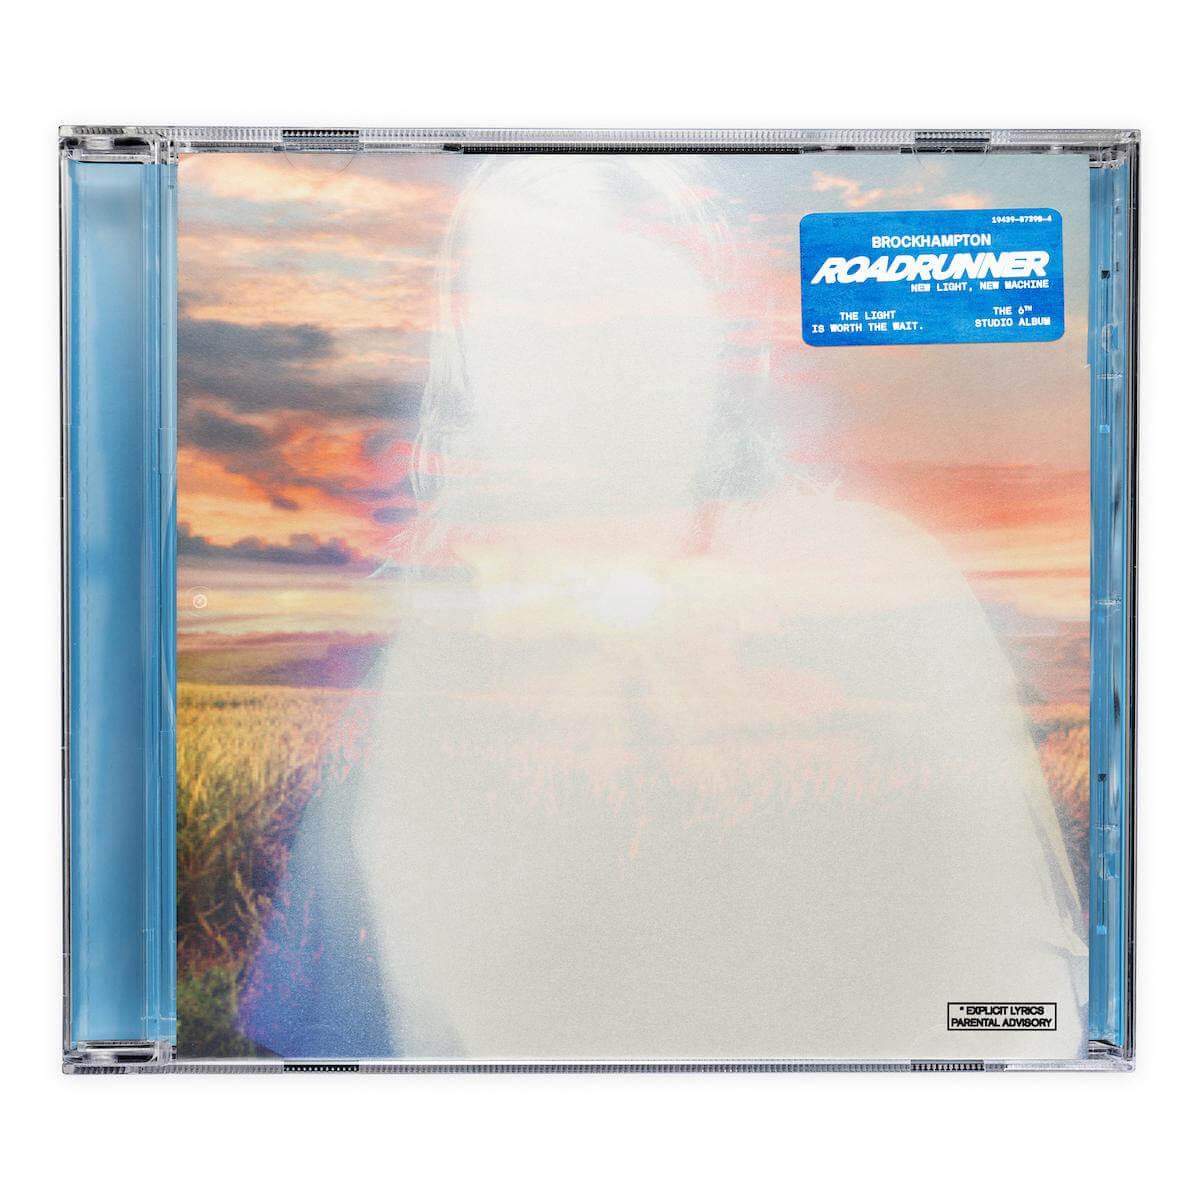 BROCKHAMPTON's new album ROADRUNNER: NEW LIGHT, NEW MACHINE features Danny Brown, A$AP Rocky, A$AP Ferg and JPEGMAFIA